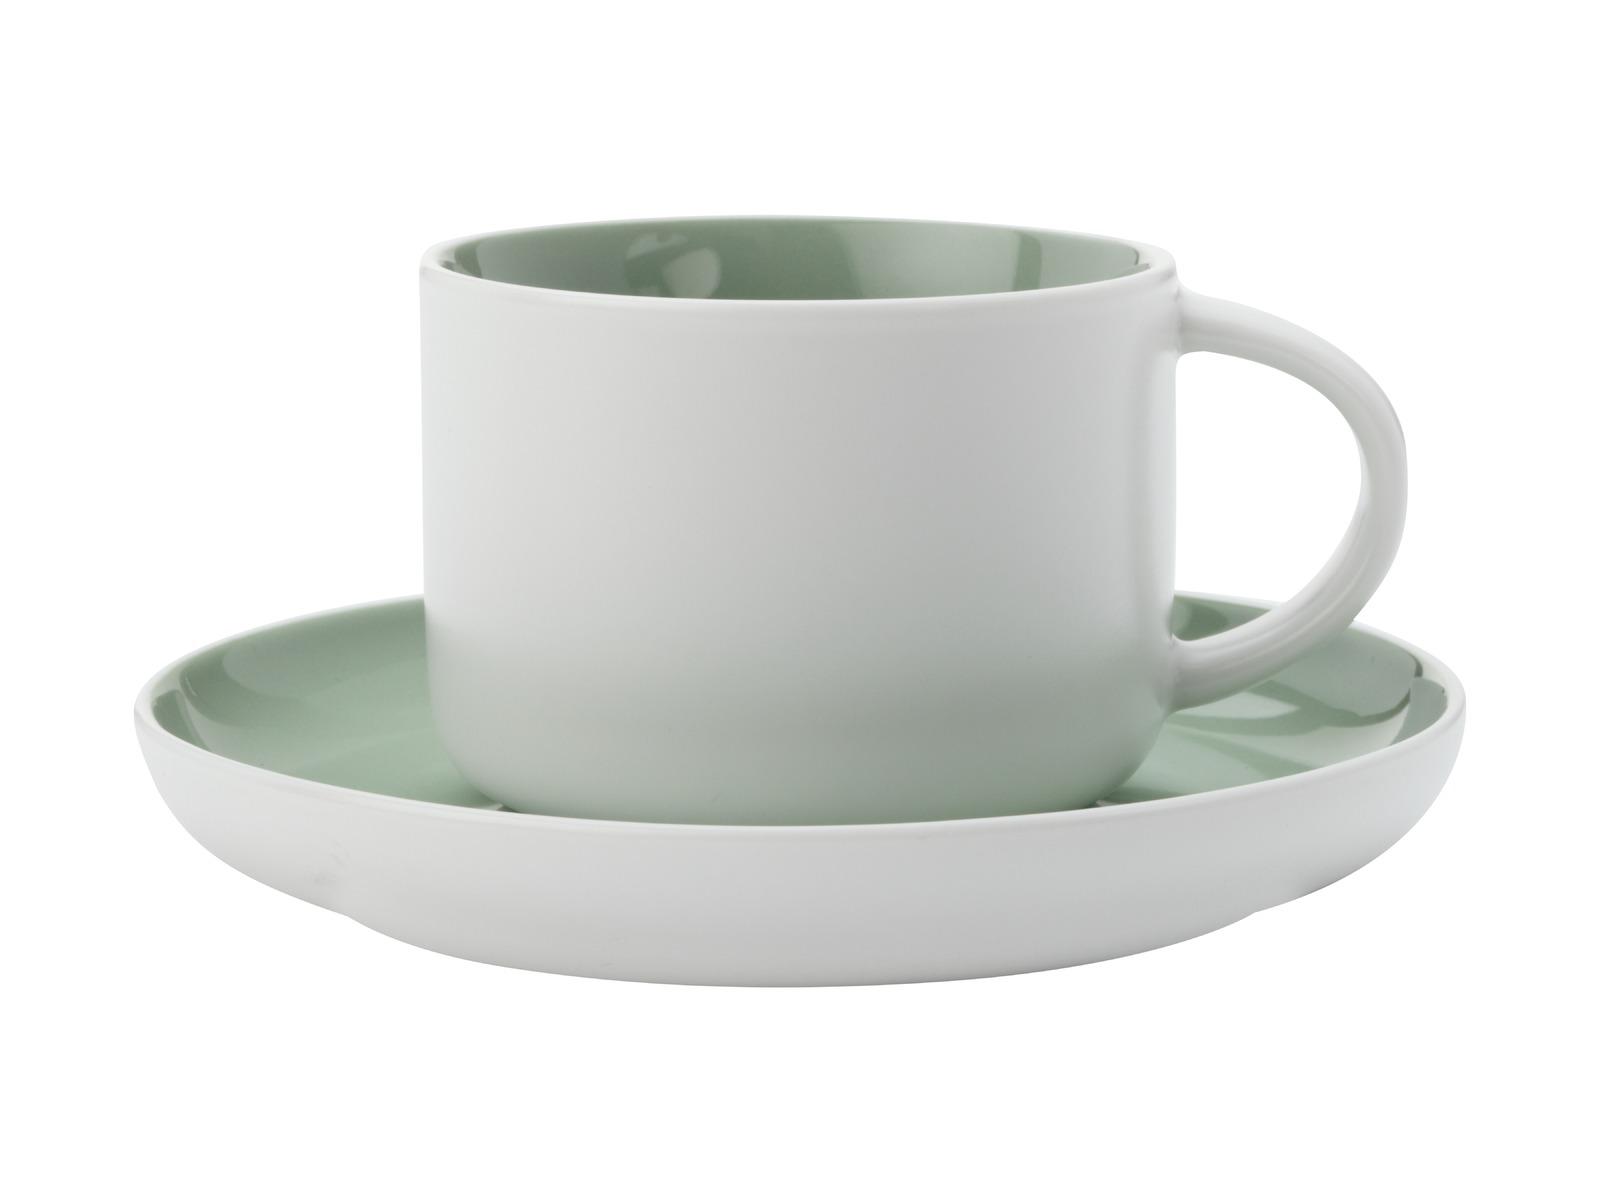 Maxwell & Williams - Tint Tea Cup & Saucer Mint (250ml) image